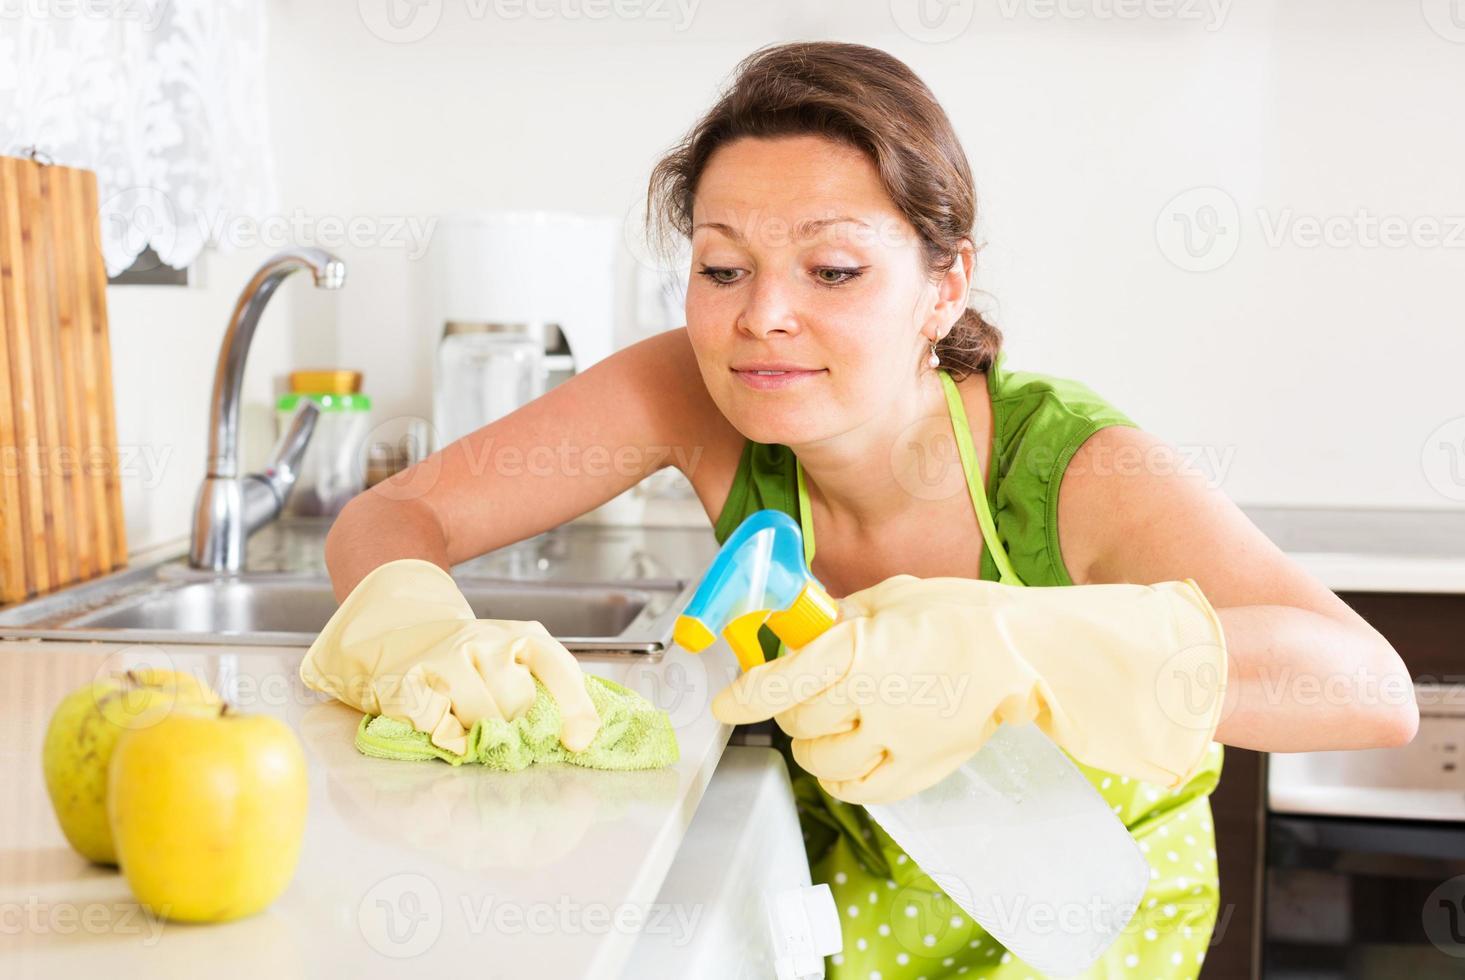 femme au foyer, nettoyage, meubles, cuisine photo